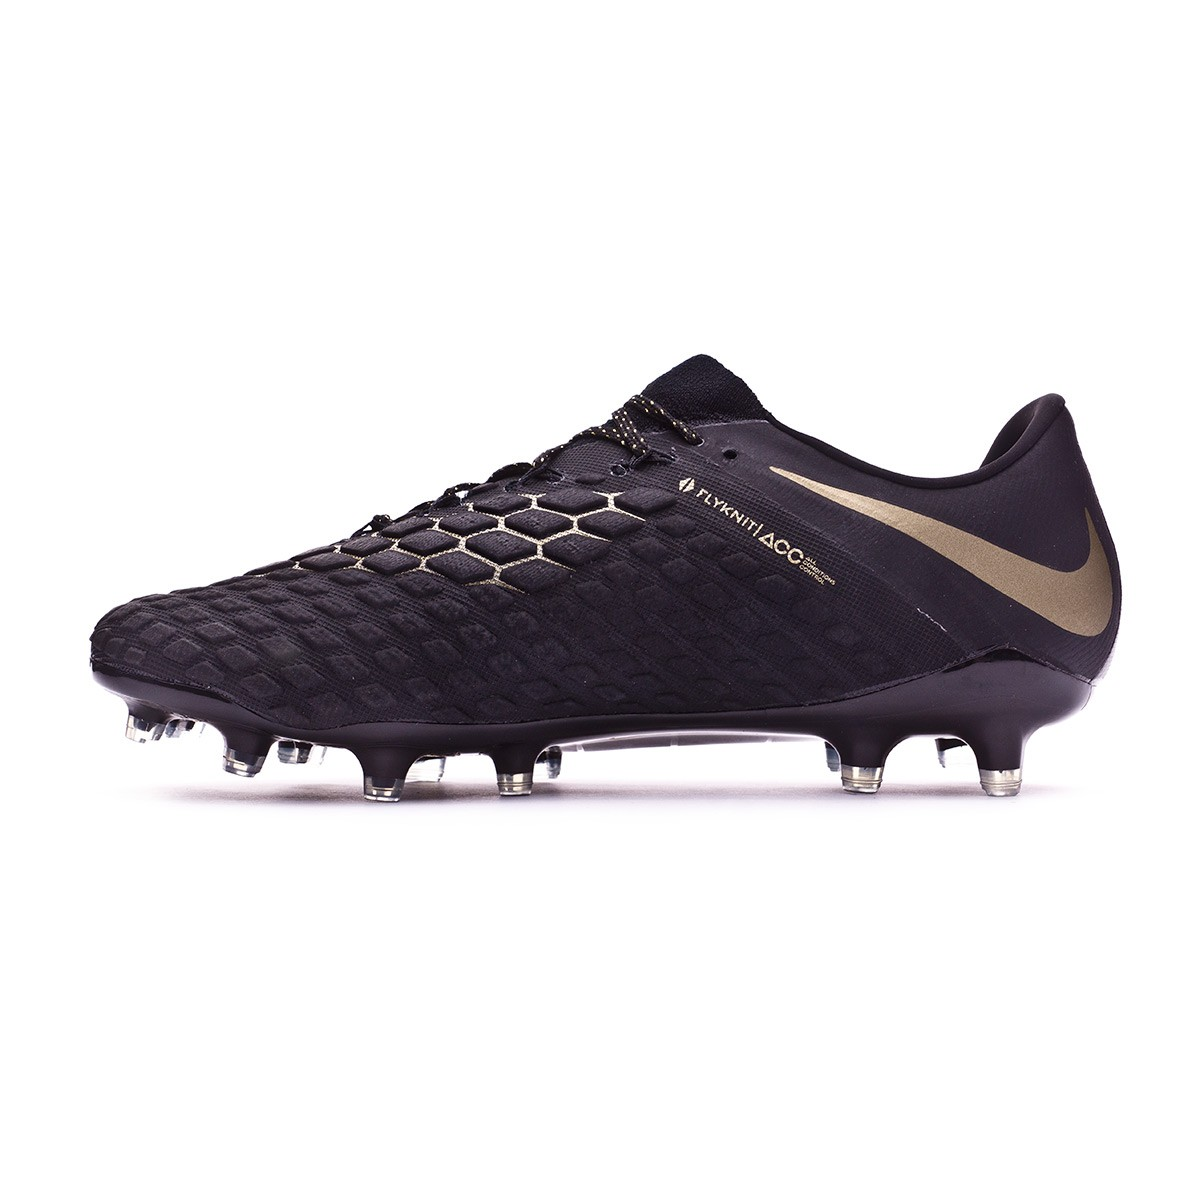 f9d9e66ae3c ... discount bota de fútbol nike hypervenom phantom iii elite fg black  metallic vivid gold soloporteros es